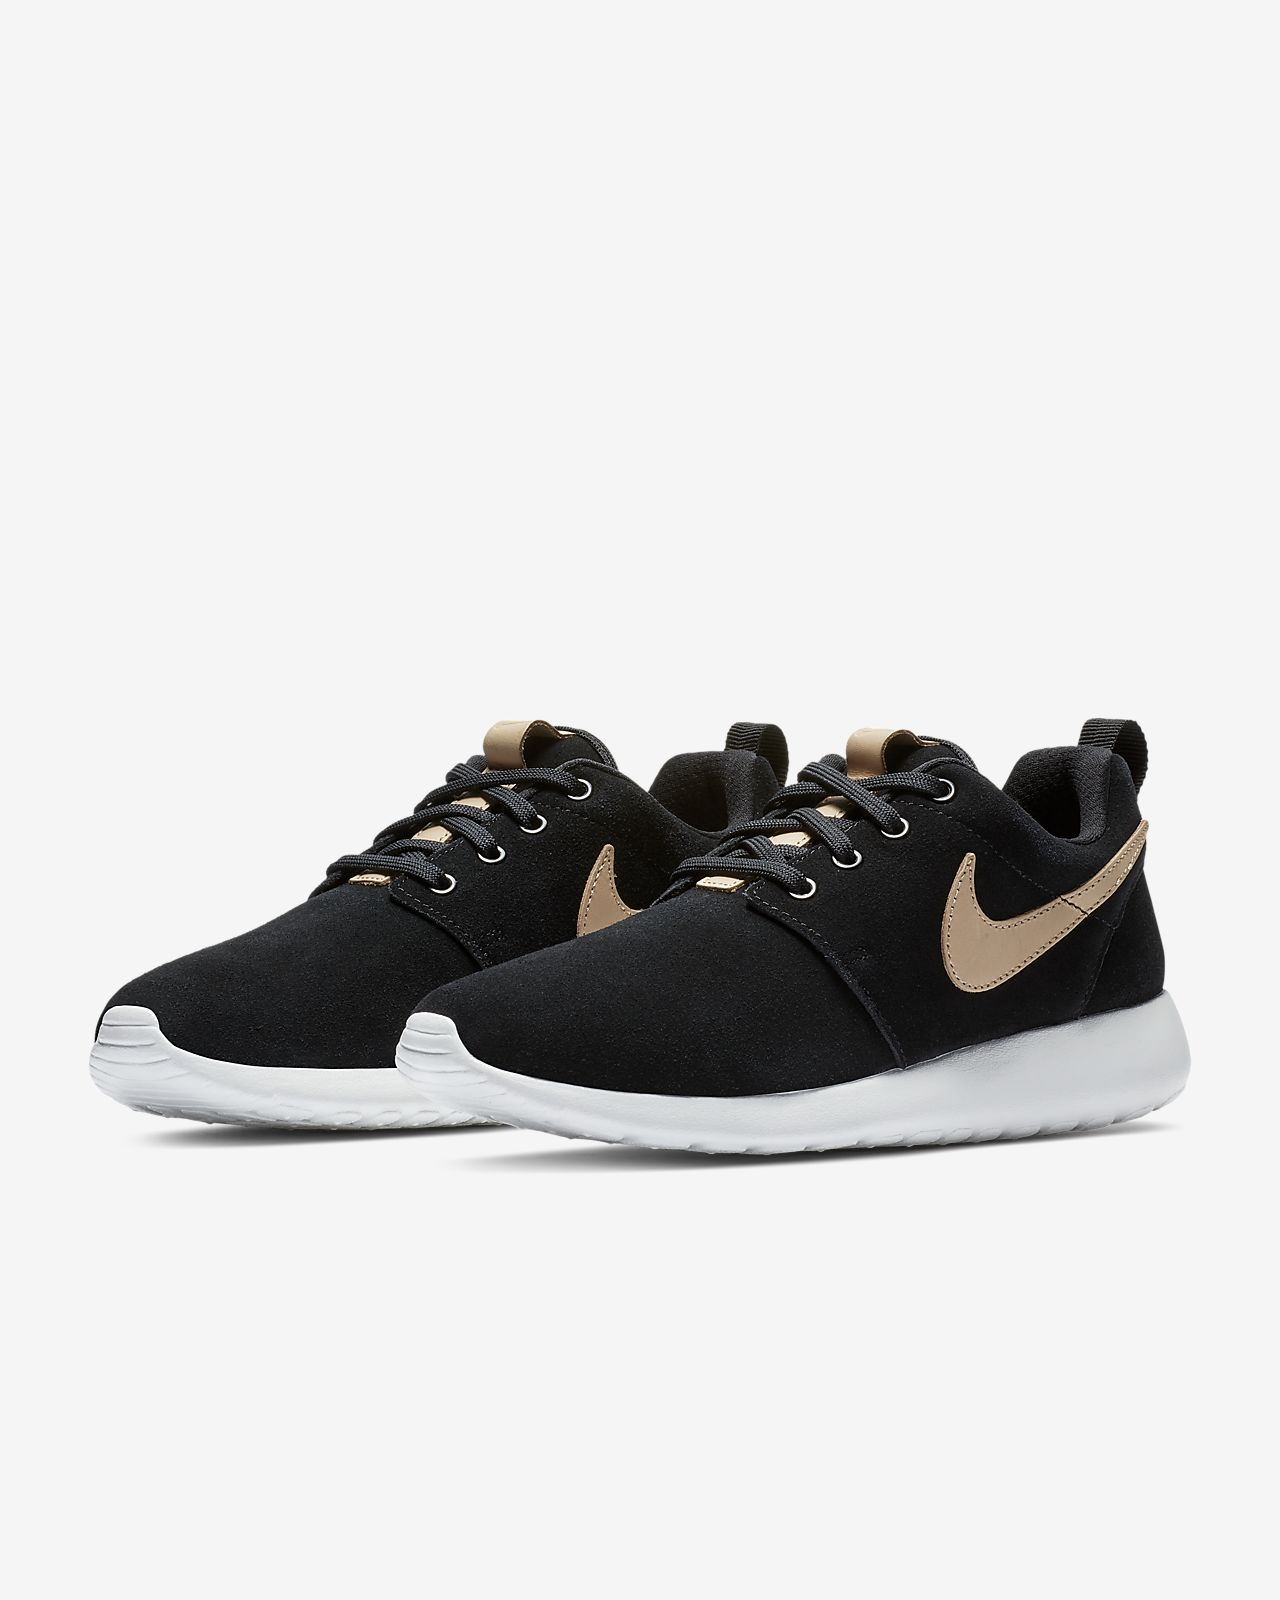 huge discount 5ba77 afd70 ... Nike Roshe One Premium Women s Shoe